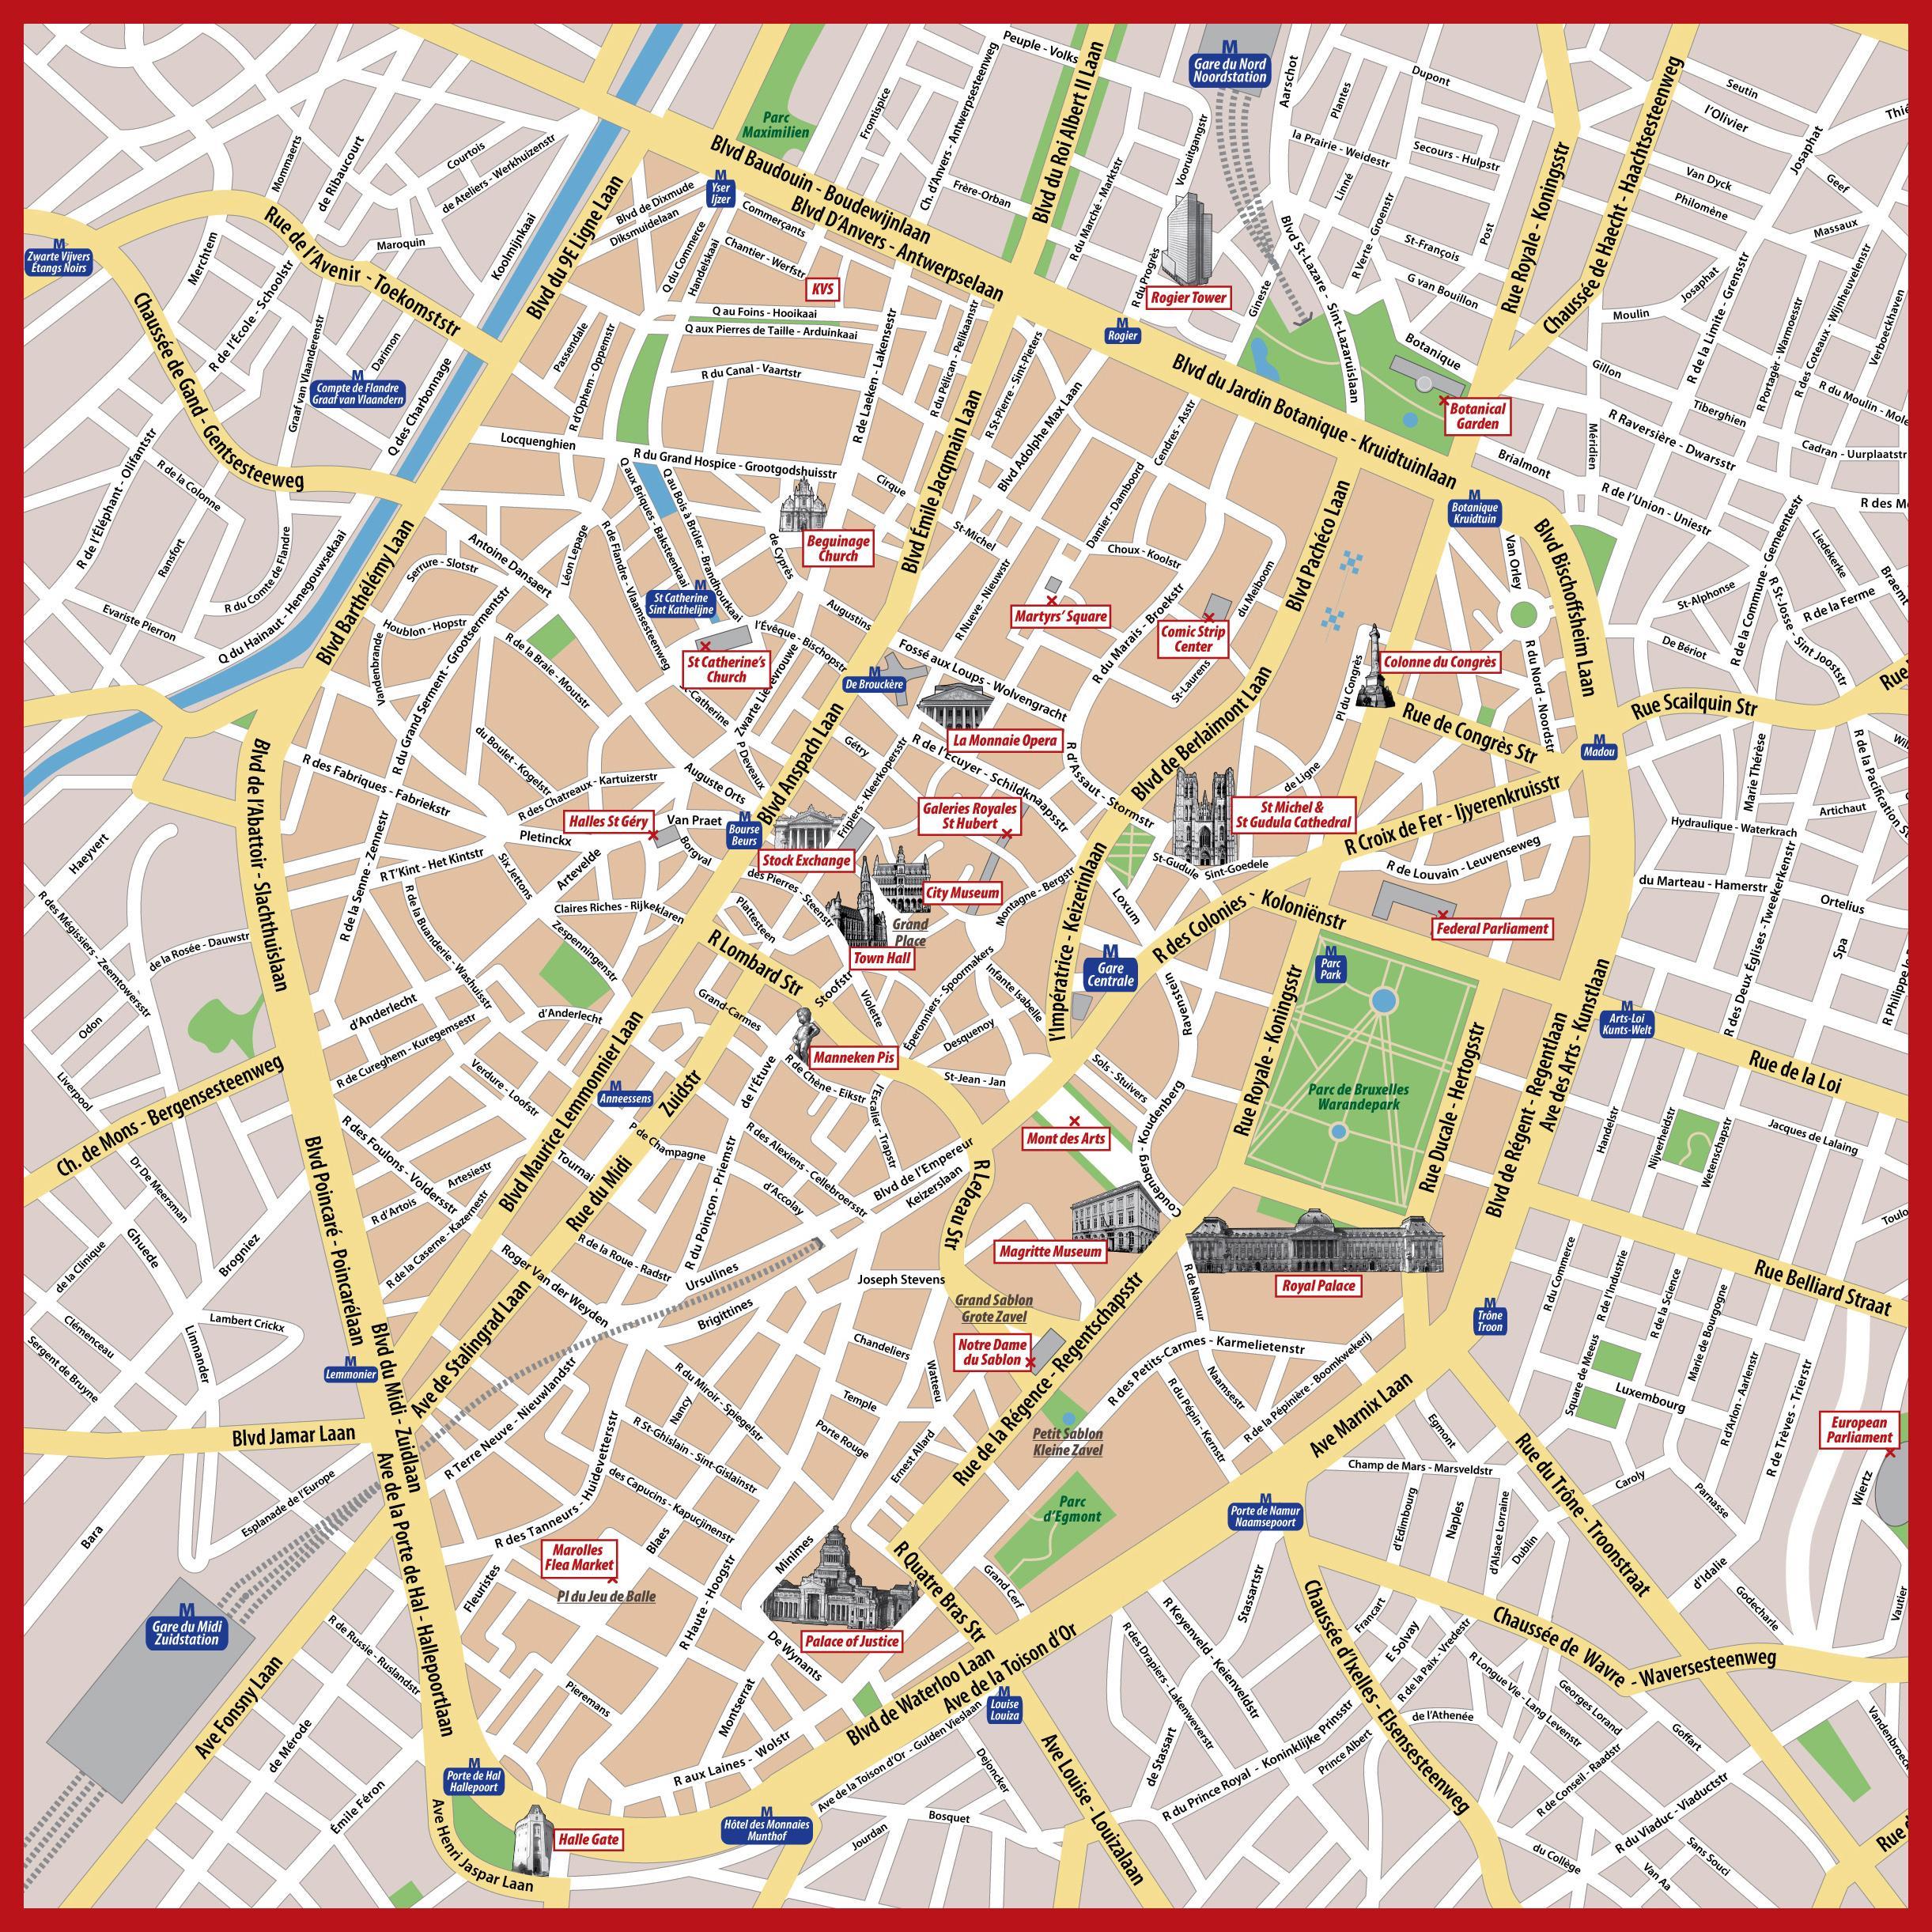 Brussels city centre map pdf - Tourist map of Brussels city centre ...